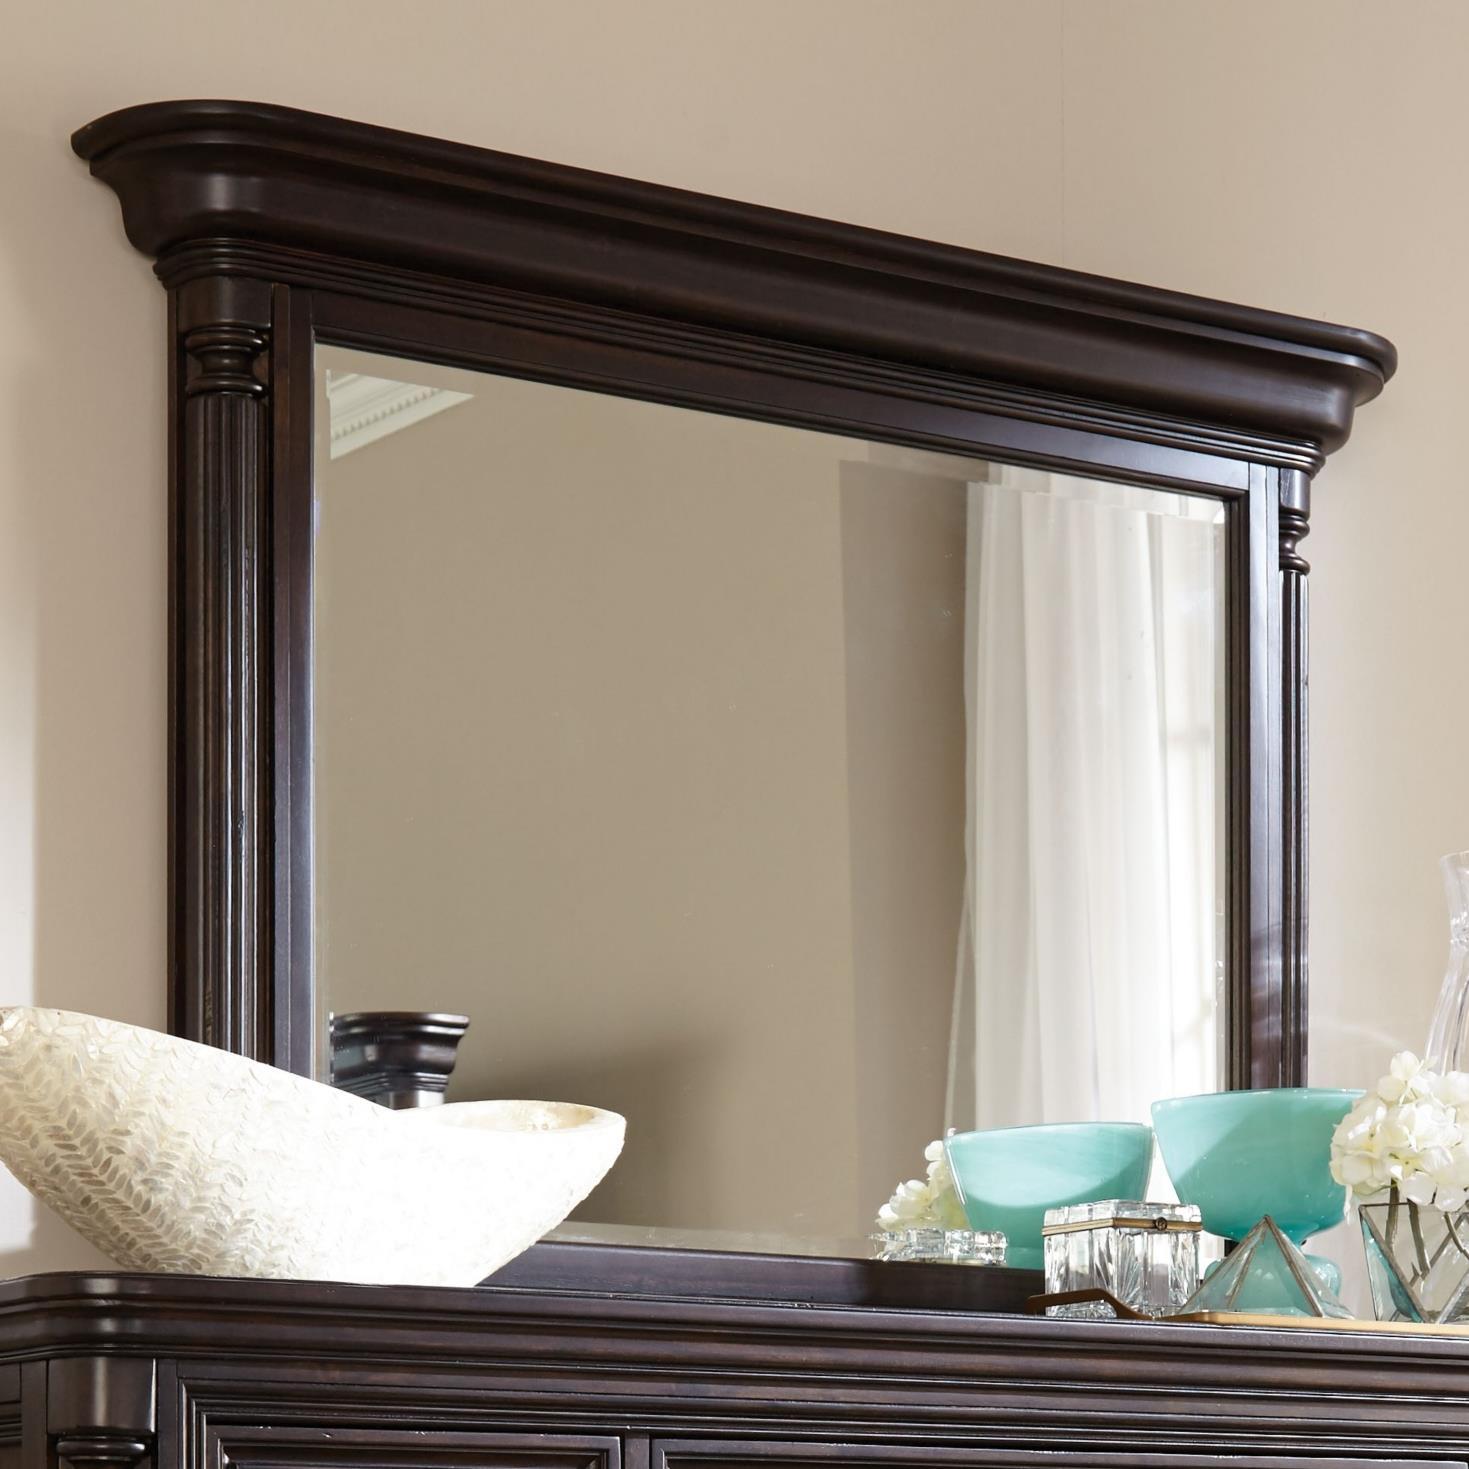 Broyhill Furniture Jessa Pillar Chesser Mirror - Item Number: 4980-236